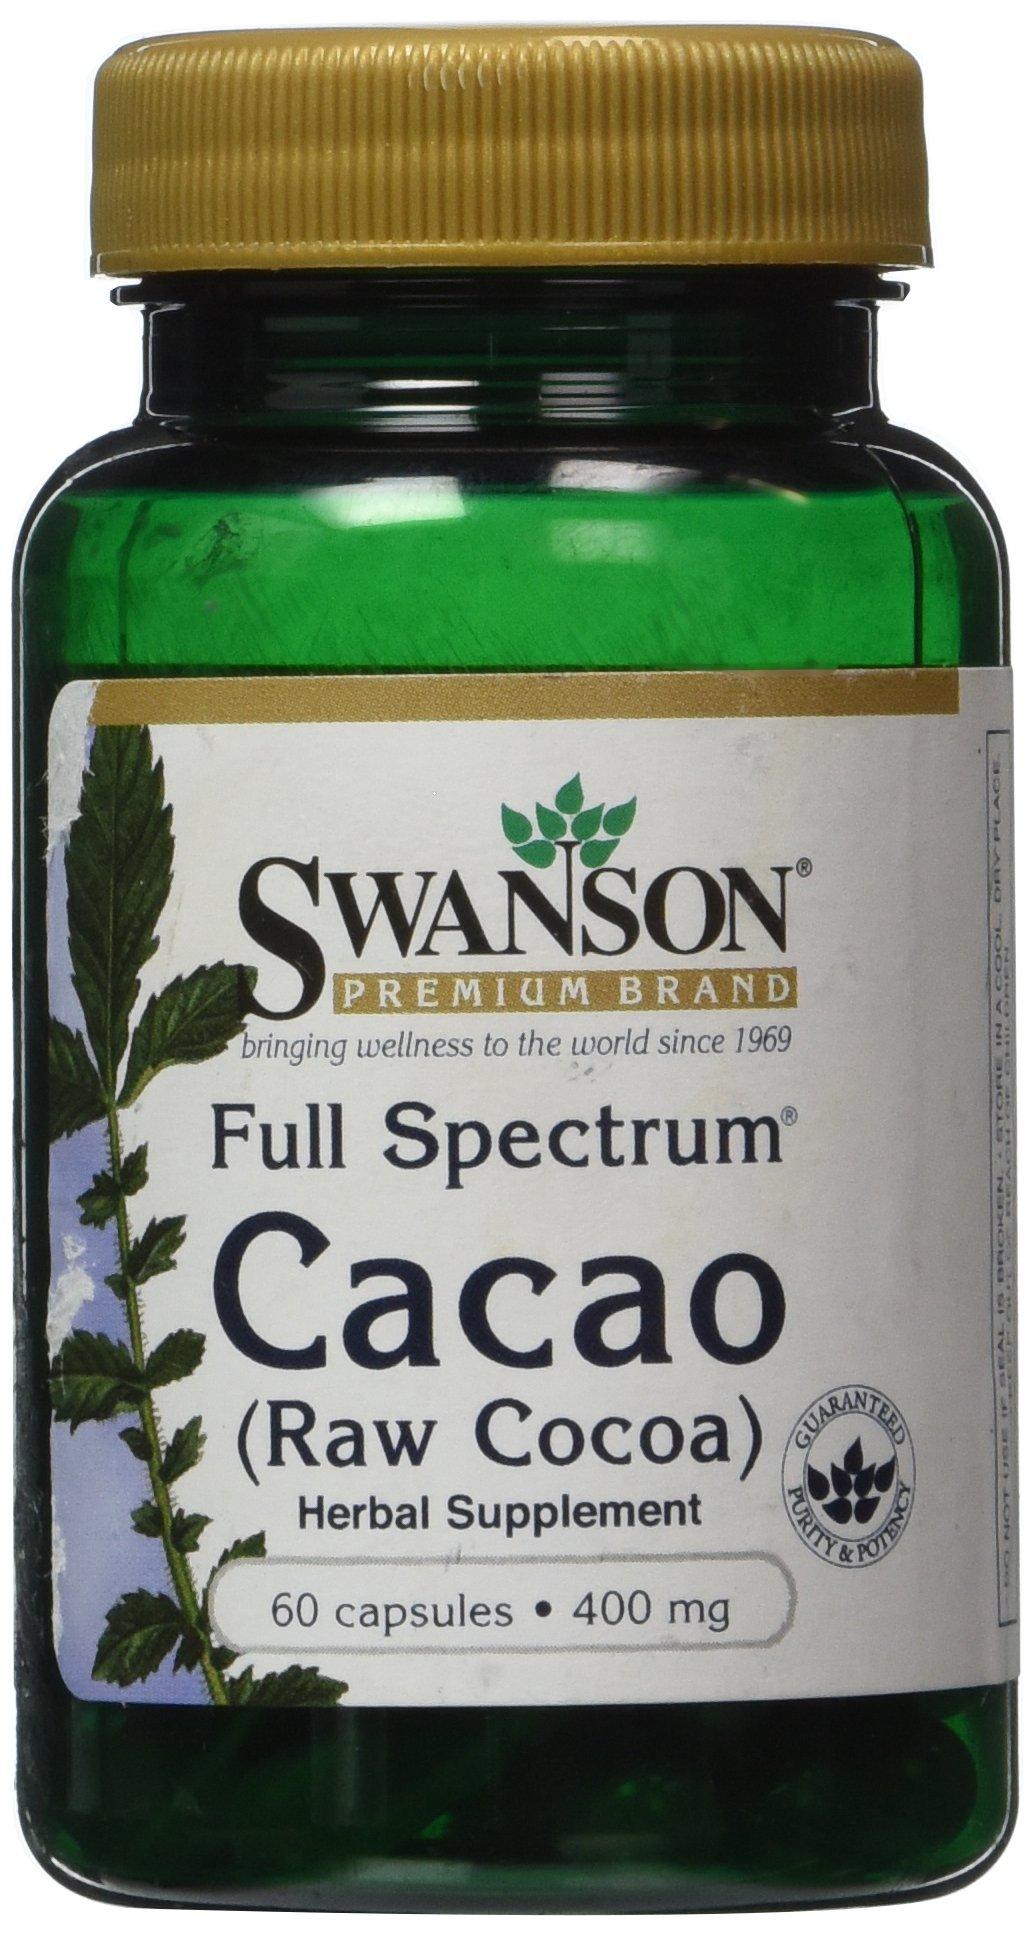 Full Spectrum Cacao (Raw Cocoa) 400 mg 60 Caps